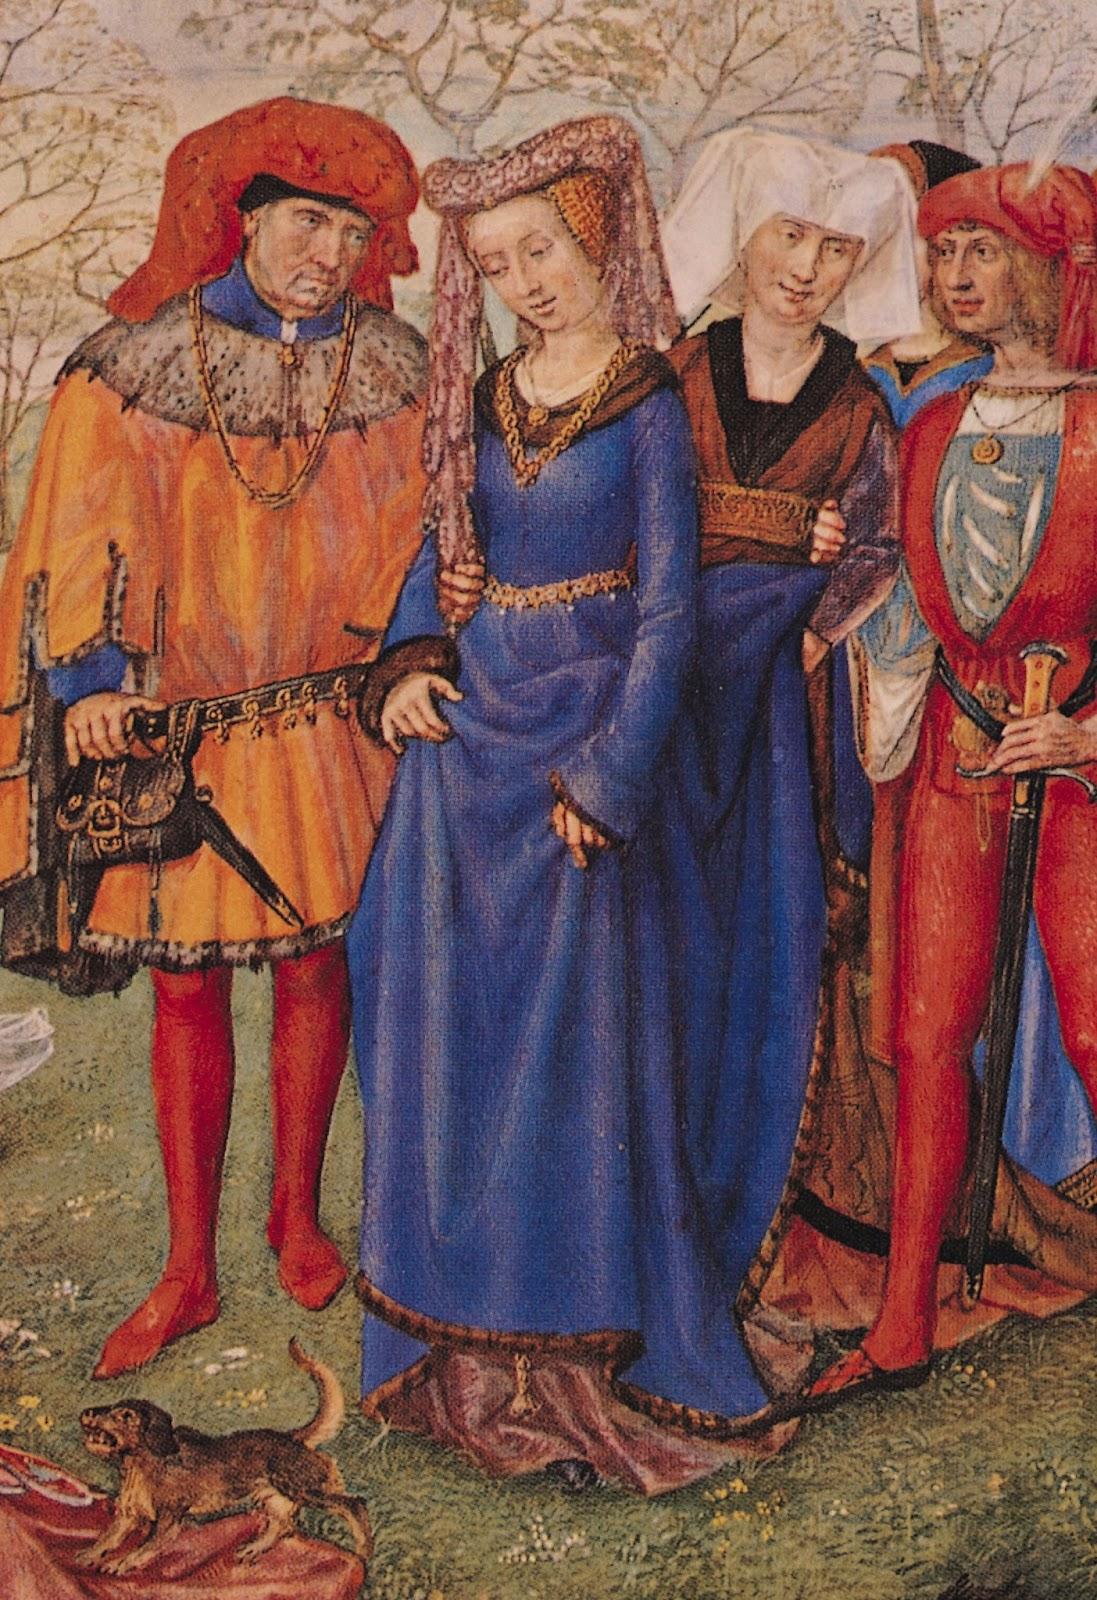 ghk-wedding-dress-history-medieval-times-de